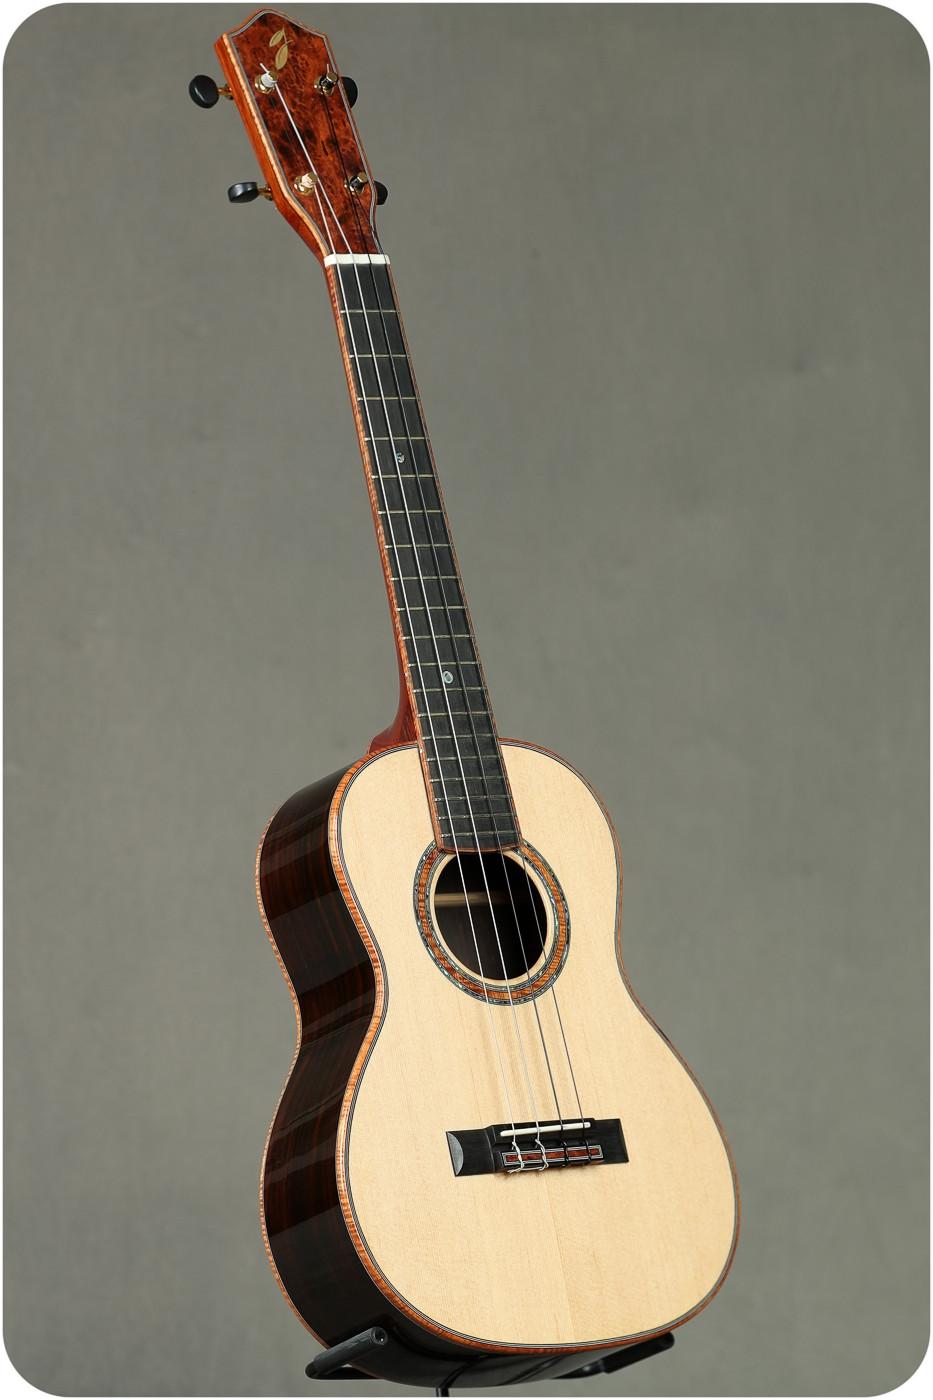 Steve Grimes Custom German Spruce/ Brazilian Rosewood Tenor #982